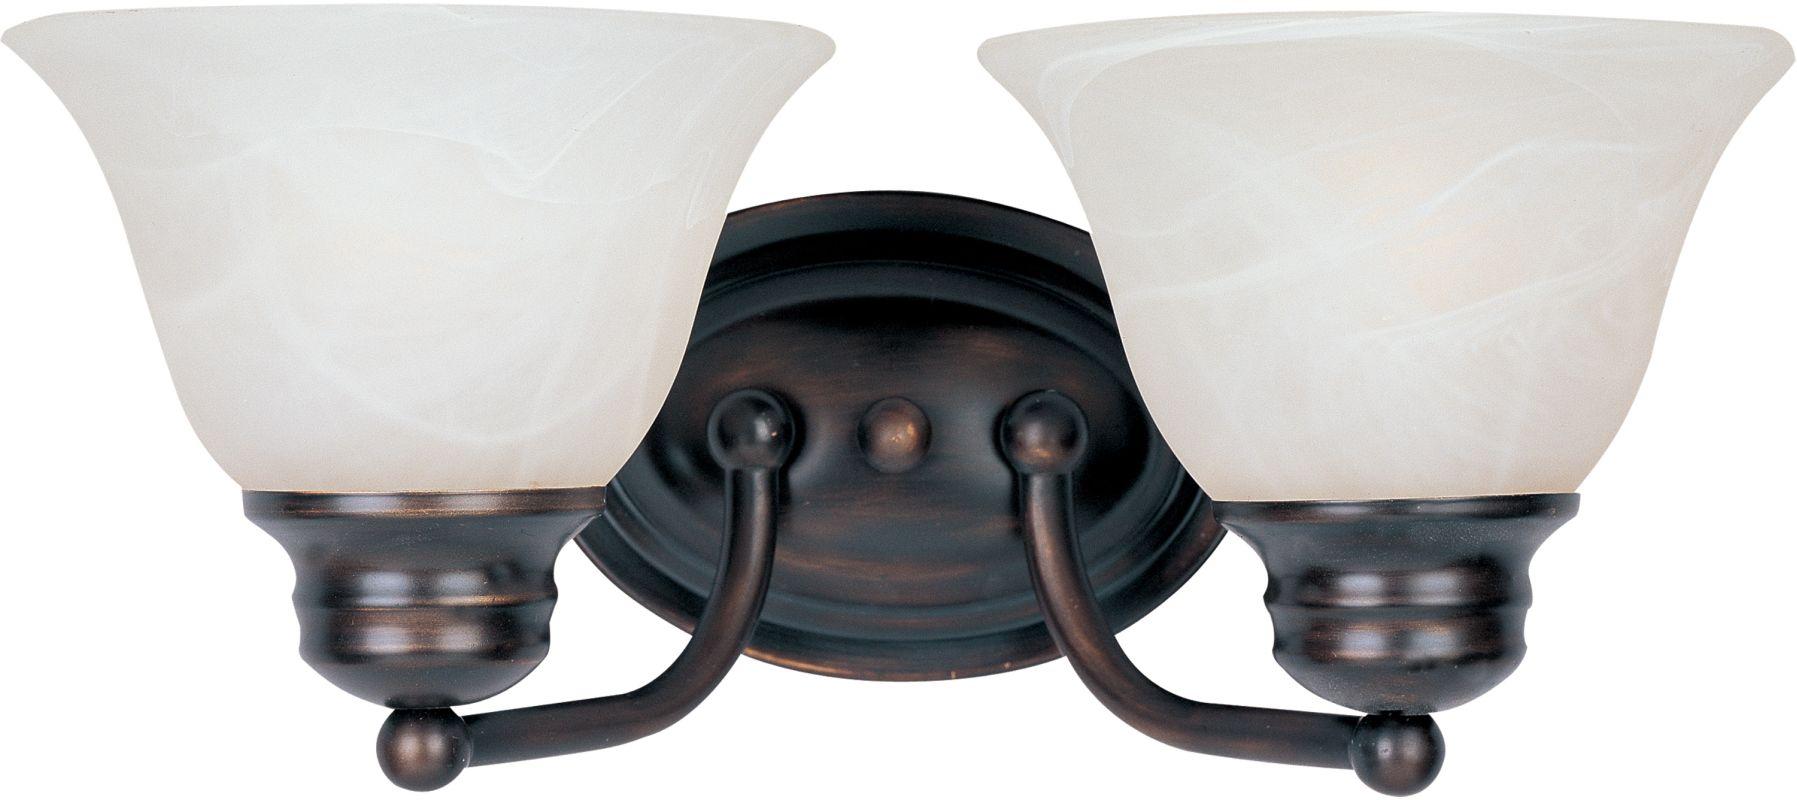 Progress Lighting Alexa Collection 2 Light Antique Bronze: Maxim 2687MROI Oil Rubbed Bronze / Marble Glass Malaga 13